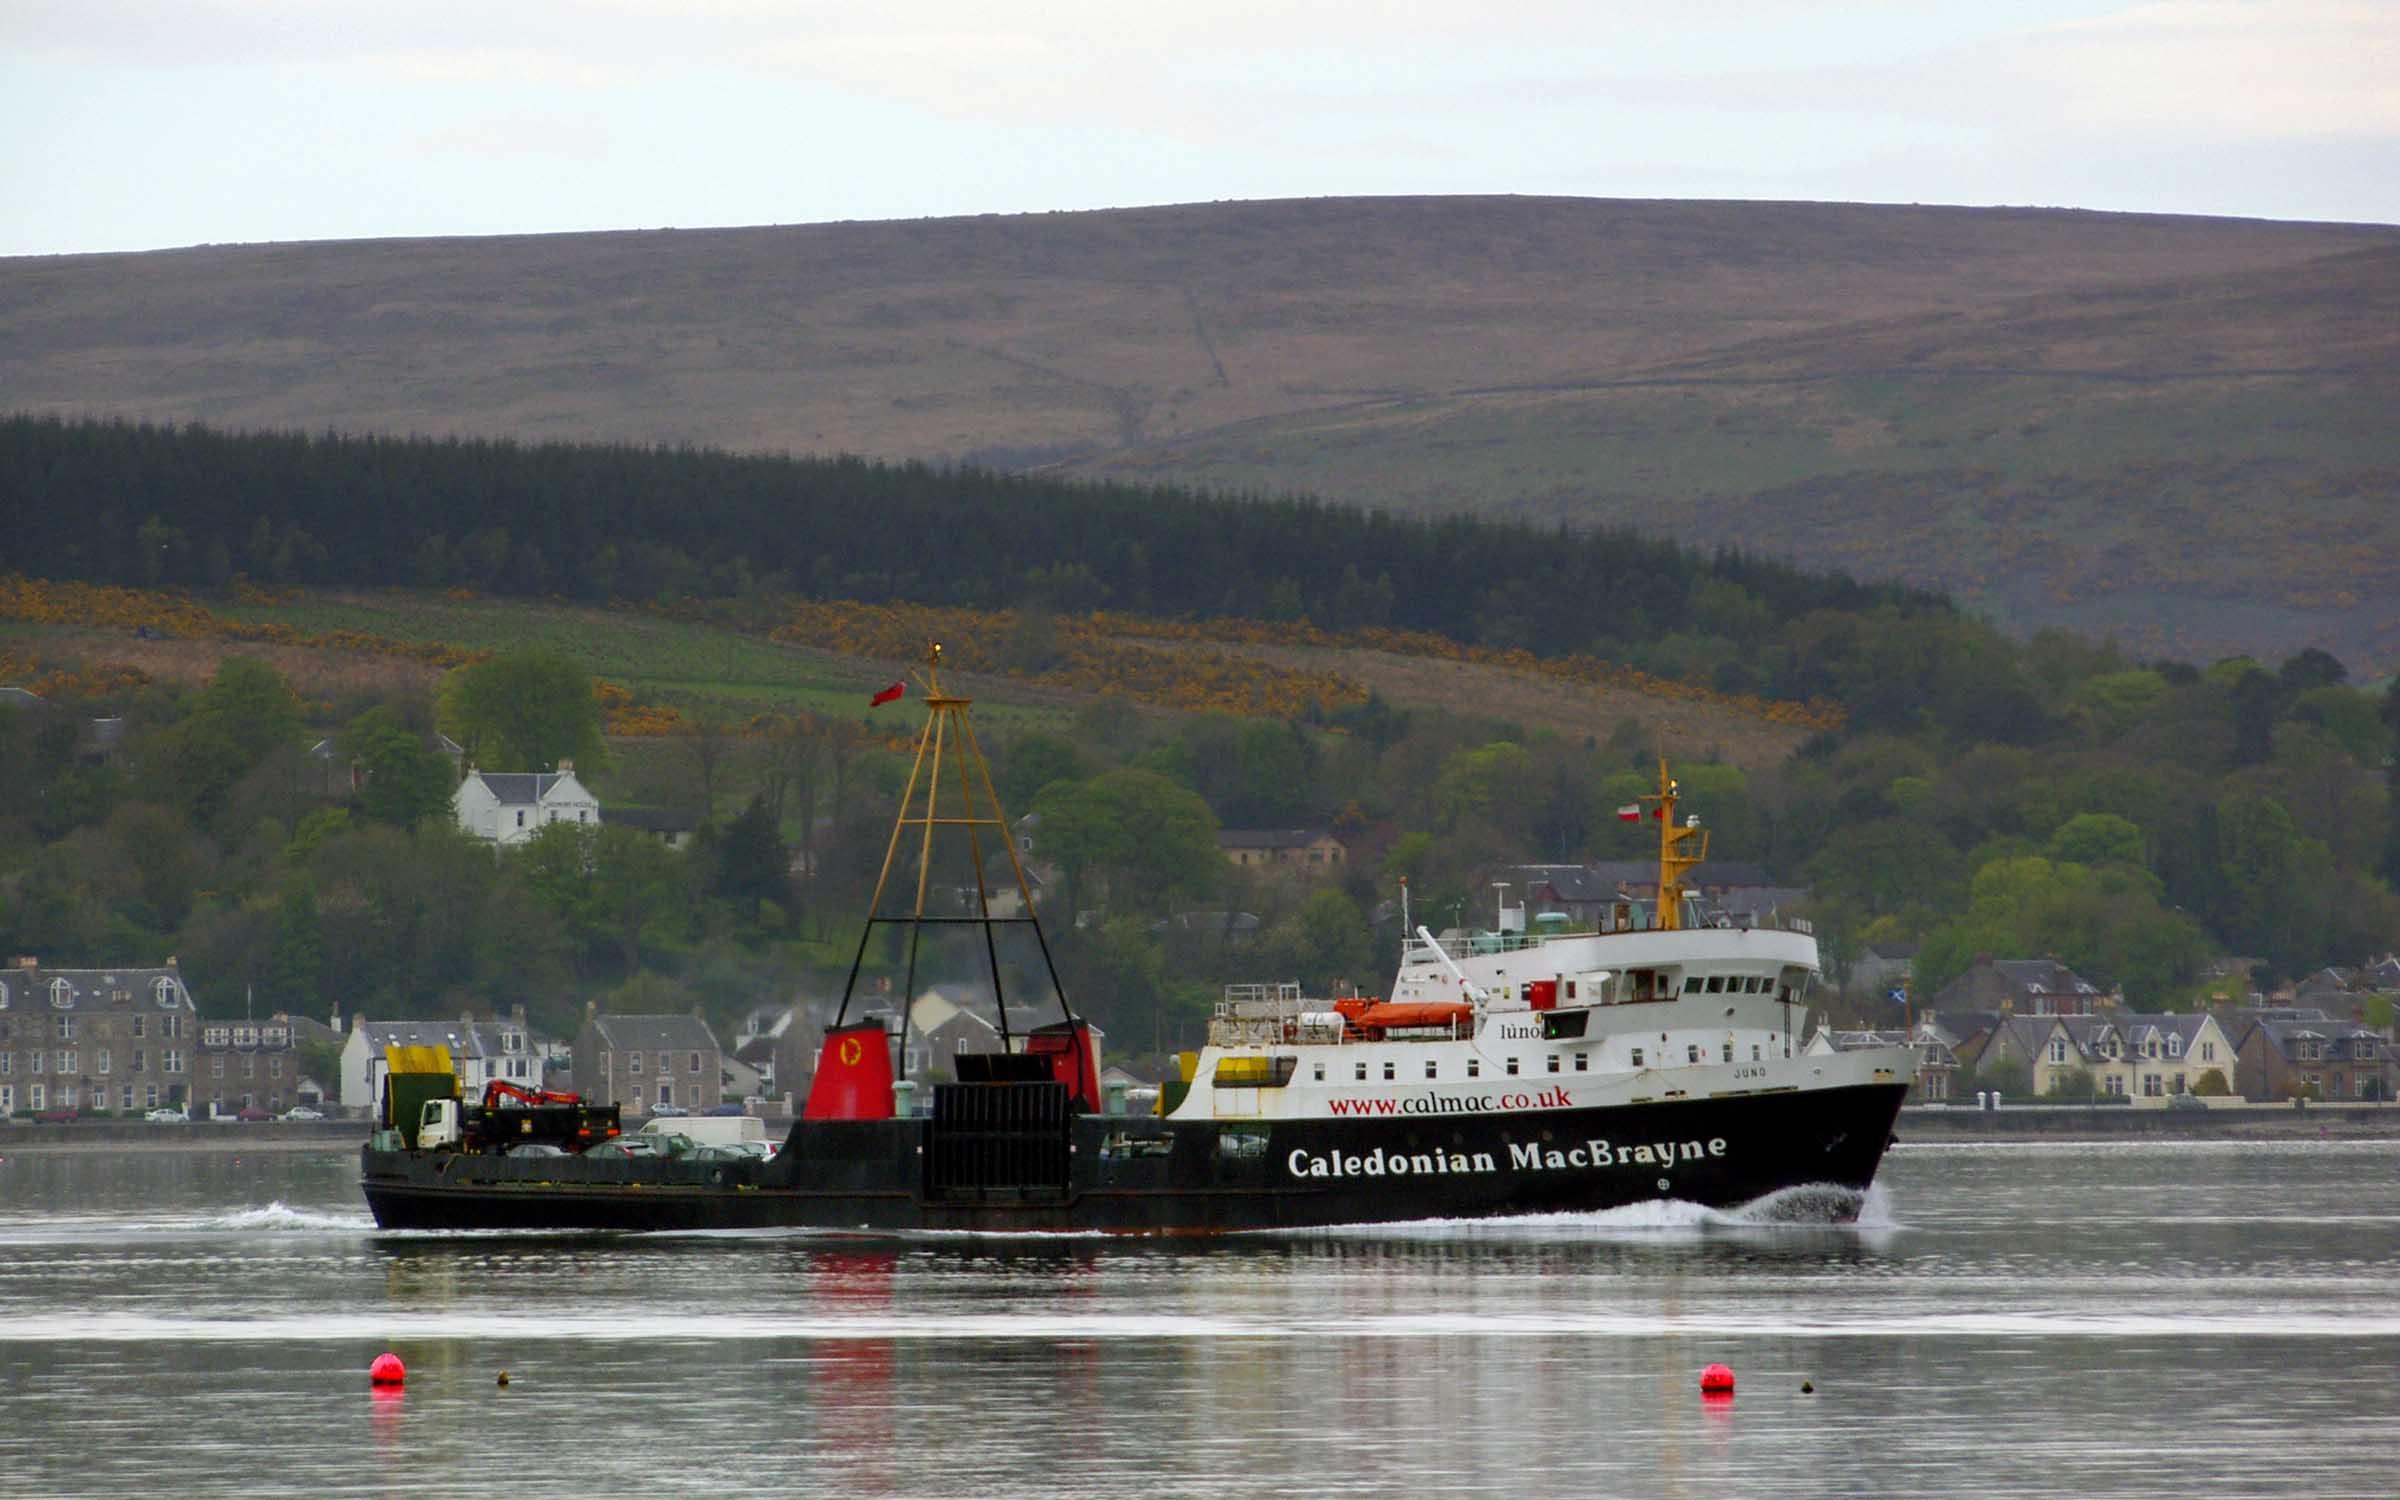 Juno in Rothesay Bay (Ships of CalMac)